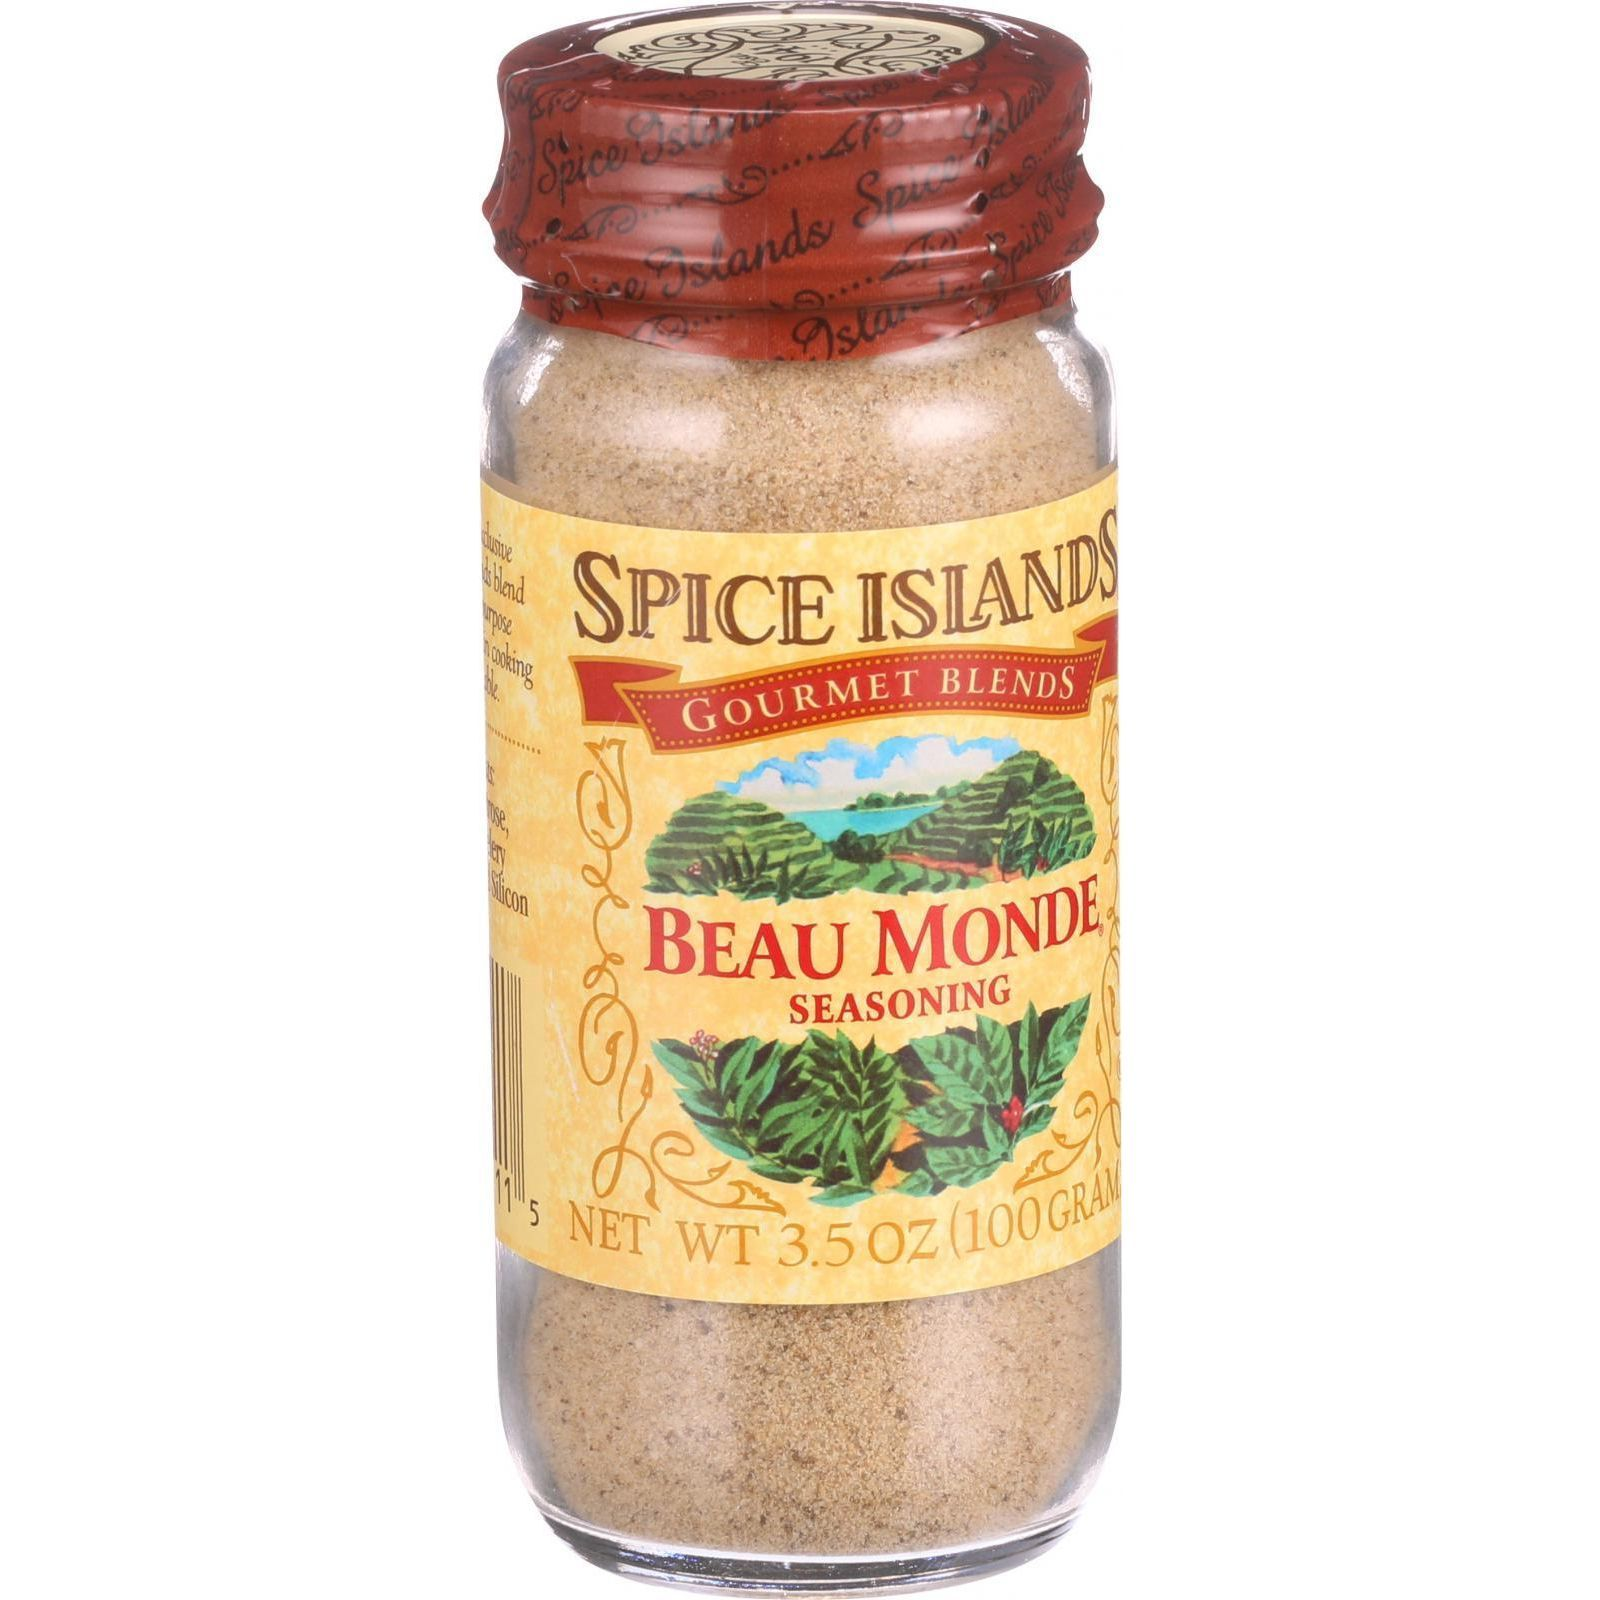 Spice Island Seasoning - Is Beau Monde - Case of 3 - 3.5 oz